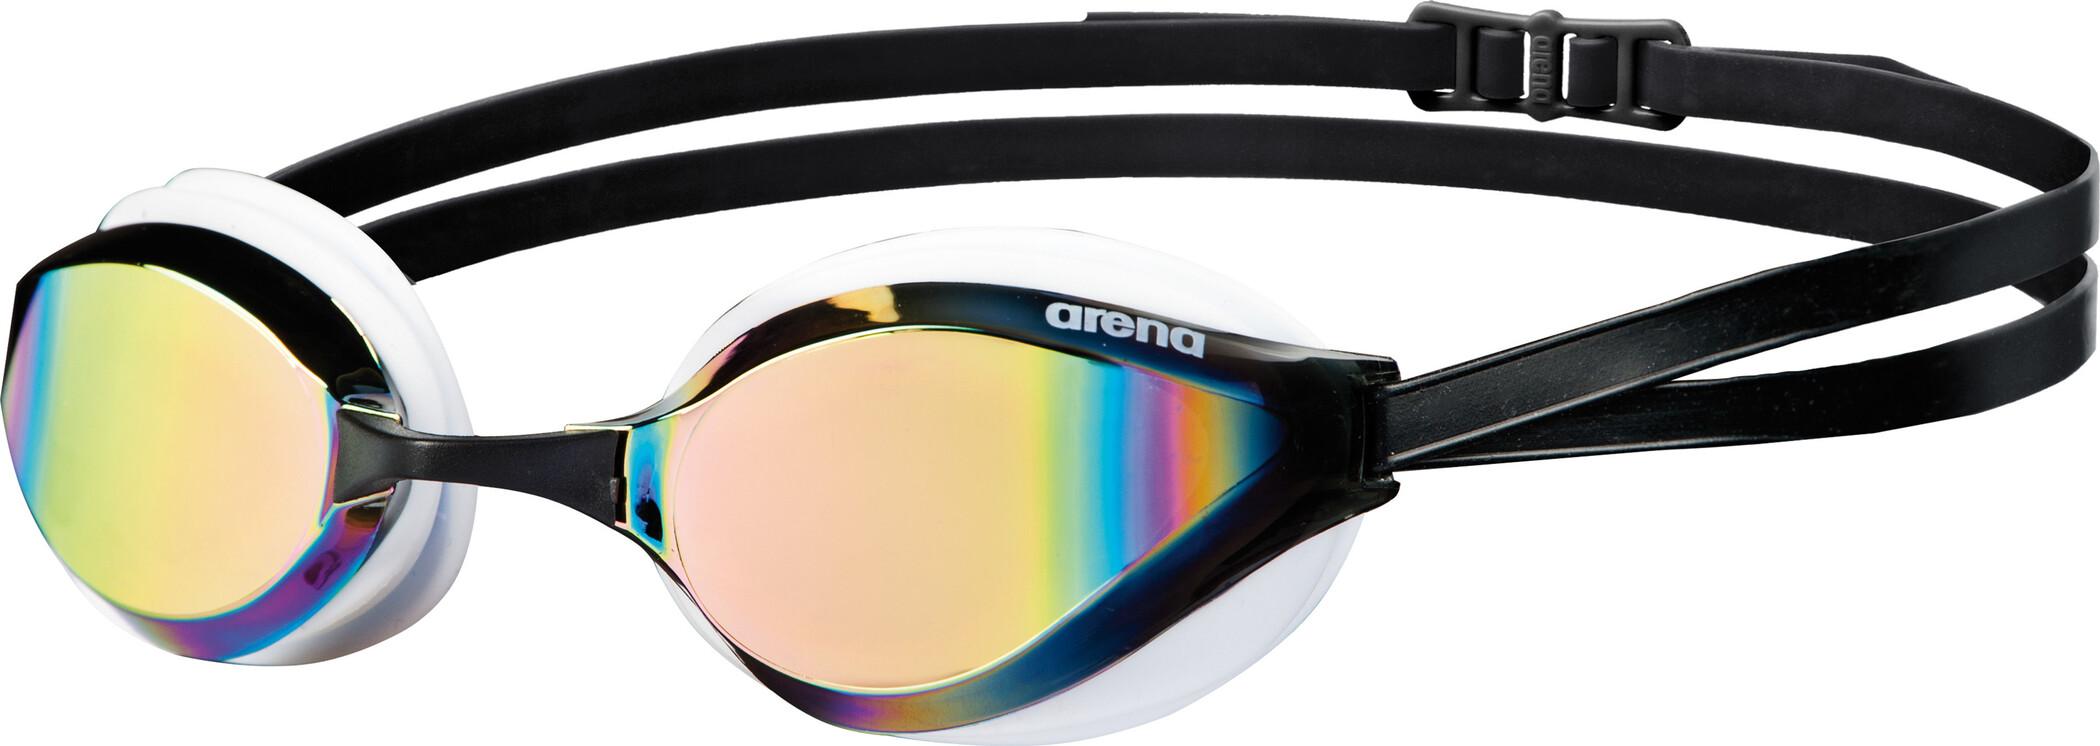 arena Python Mirror Svømmebriller, revo-white   Swim equipment